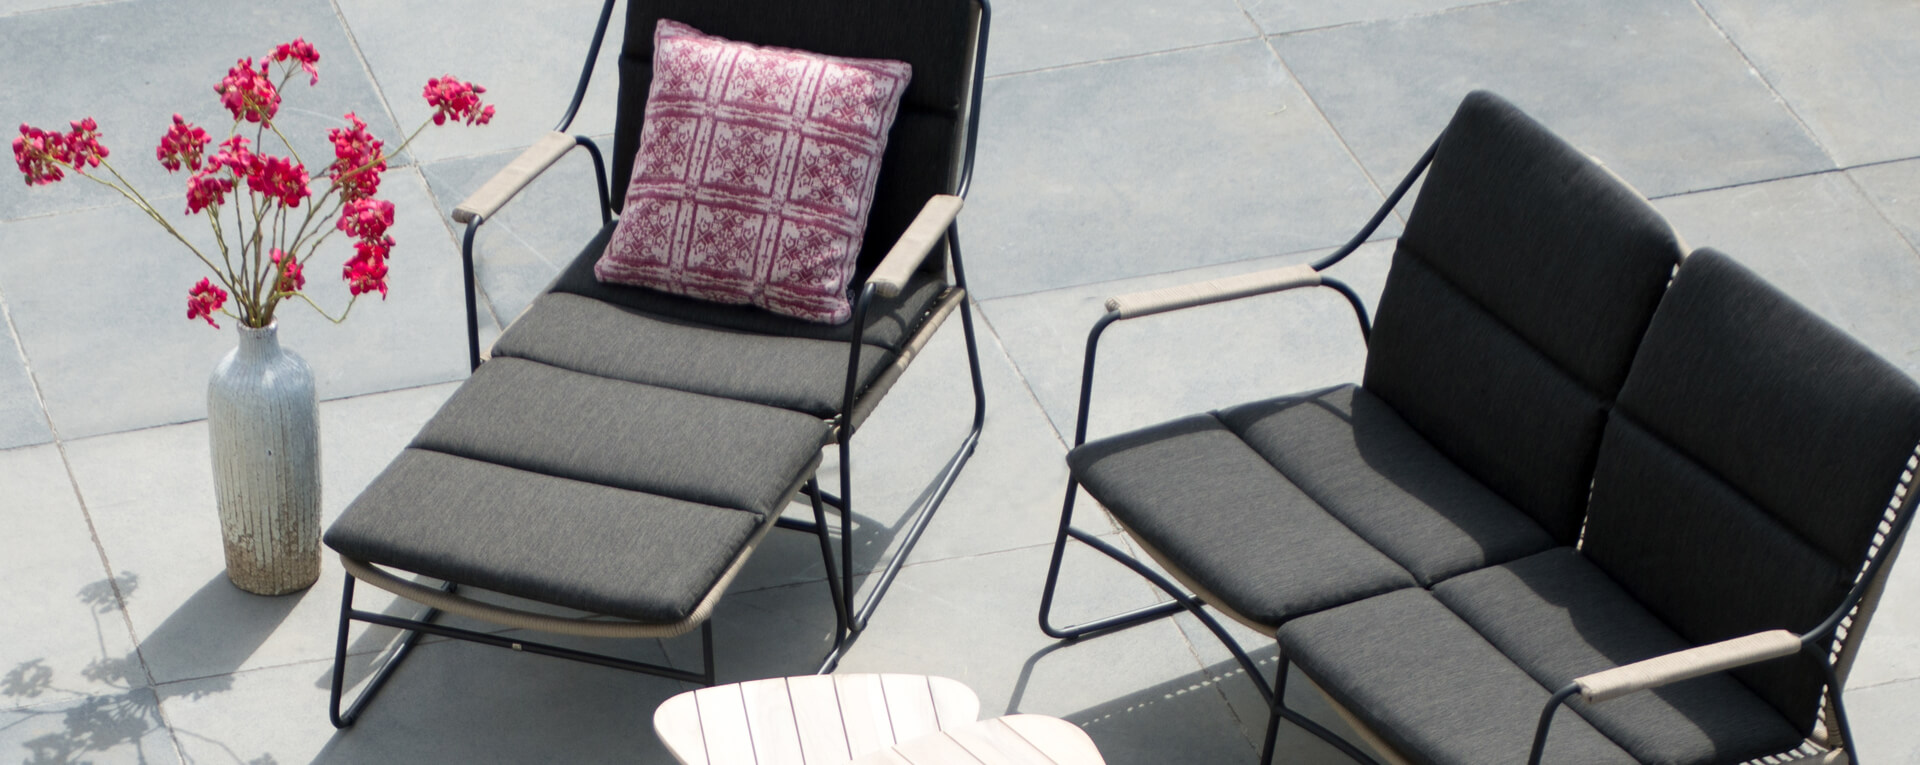 4 Seasons Outdoor Scandic Loungeset — Tuinmeubelkorting.nl